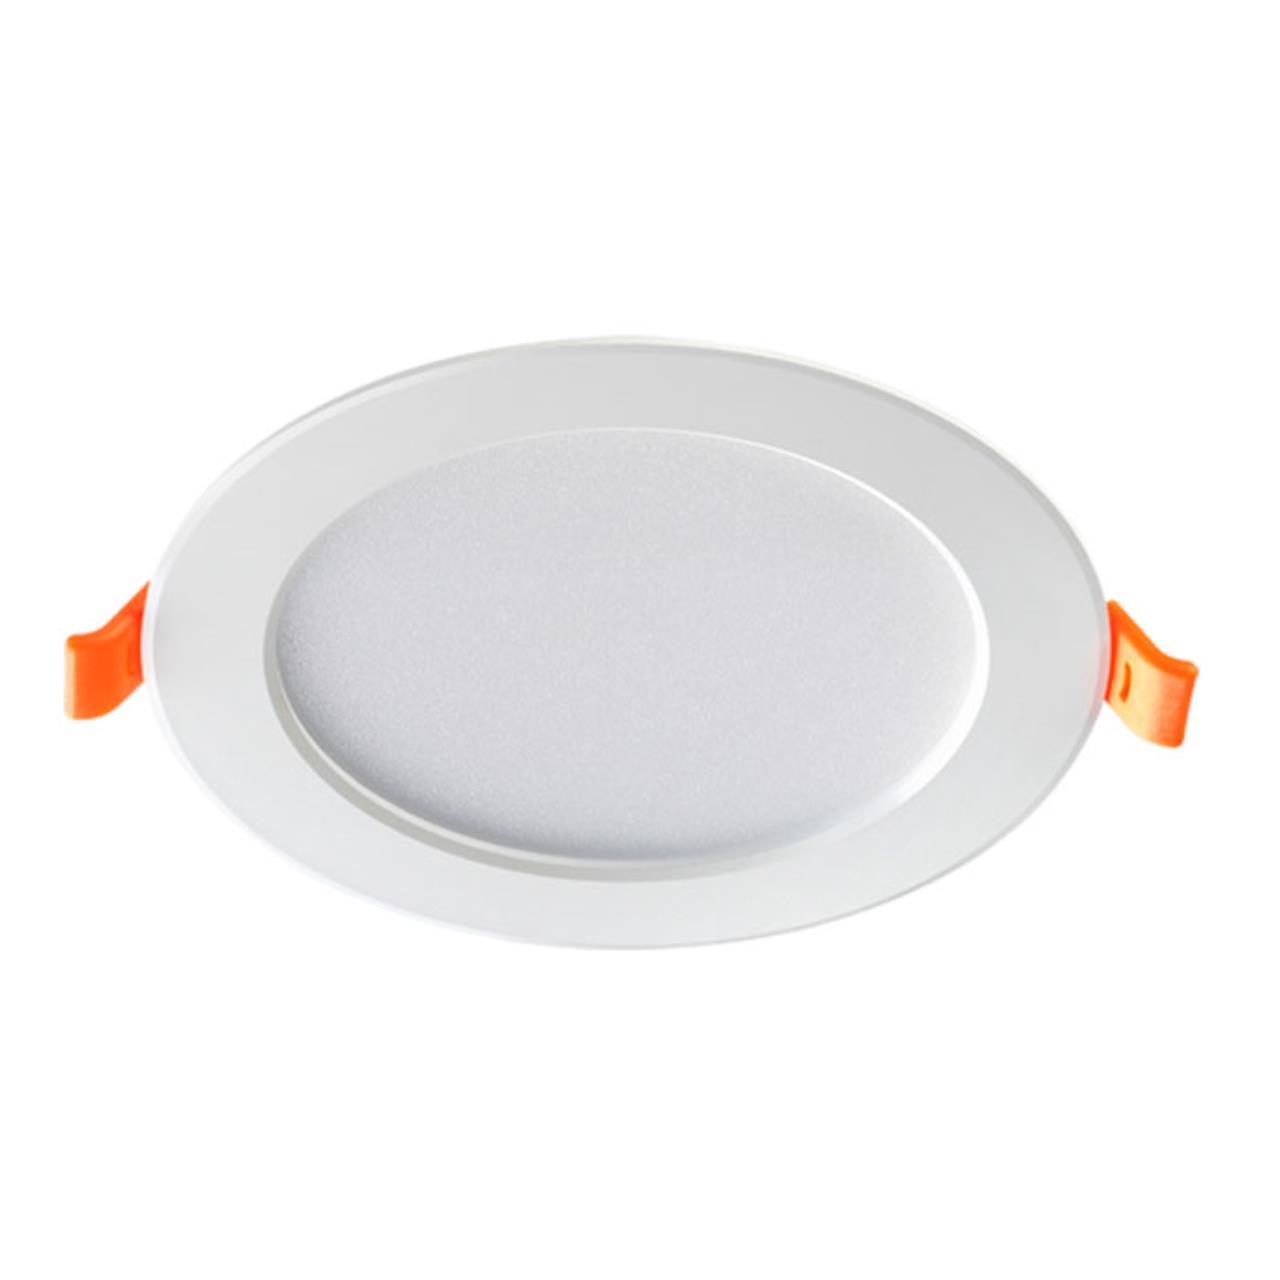 357573 SPOT NT18 079 белый Встраиваемый светильник IP20 LED 3000K 10W 175-265V LUNA